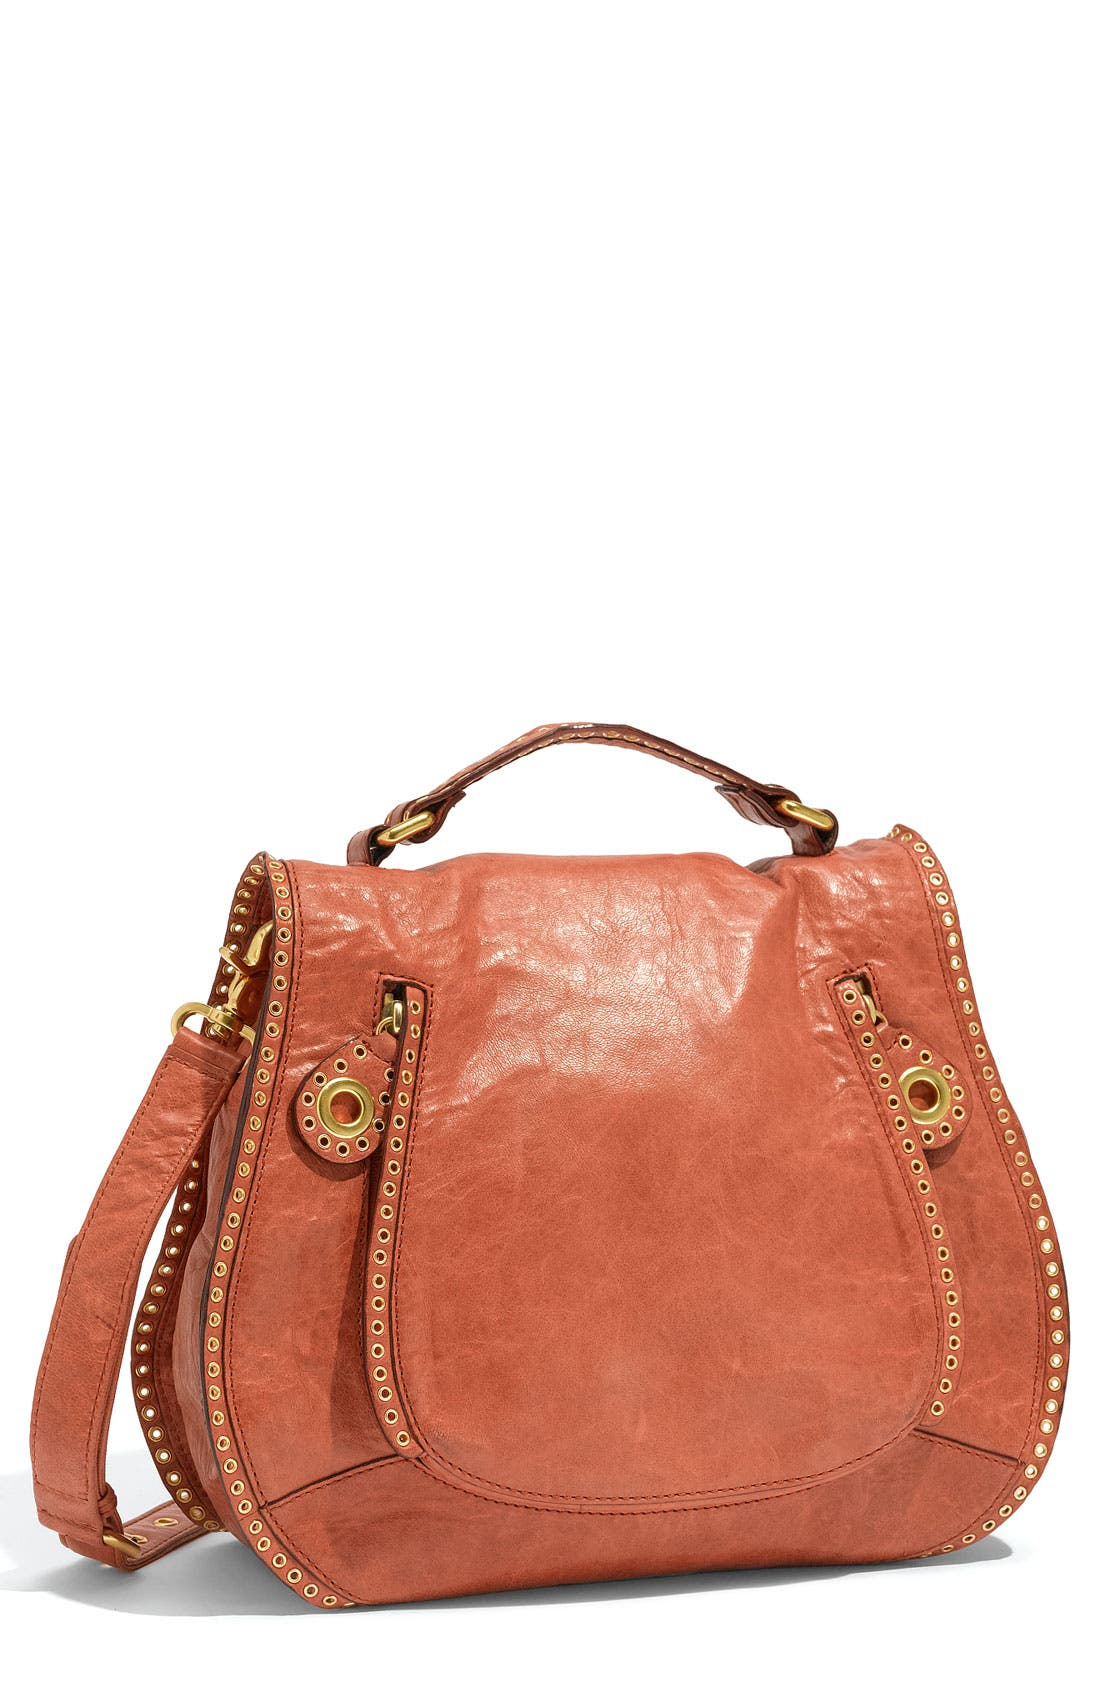 Main Image - Rebecca Minkoff 'Vanity' Glazed Leather Crossbody Bag